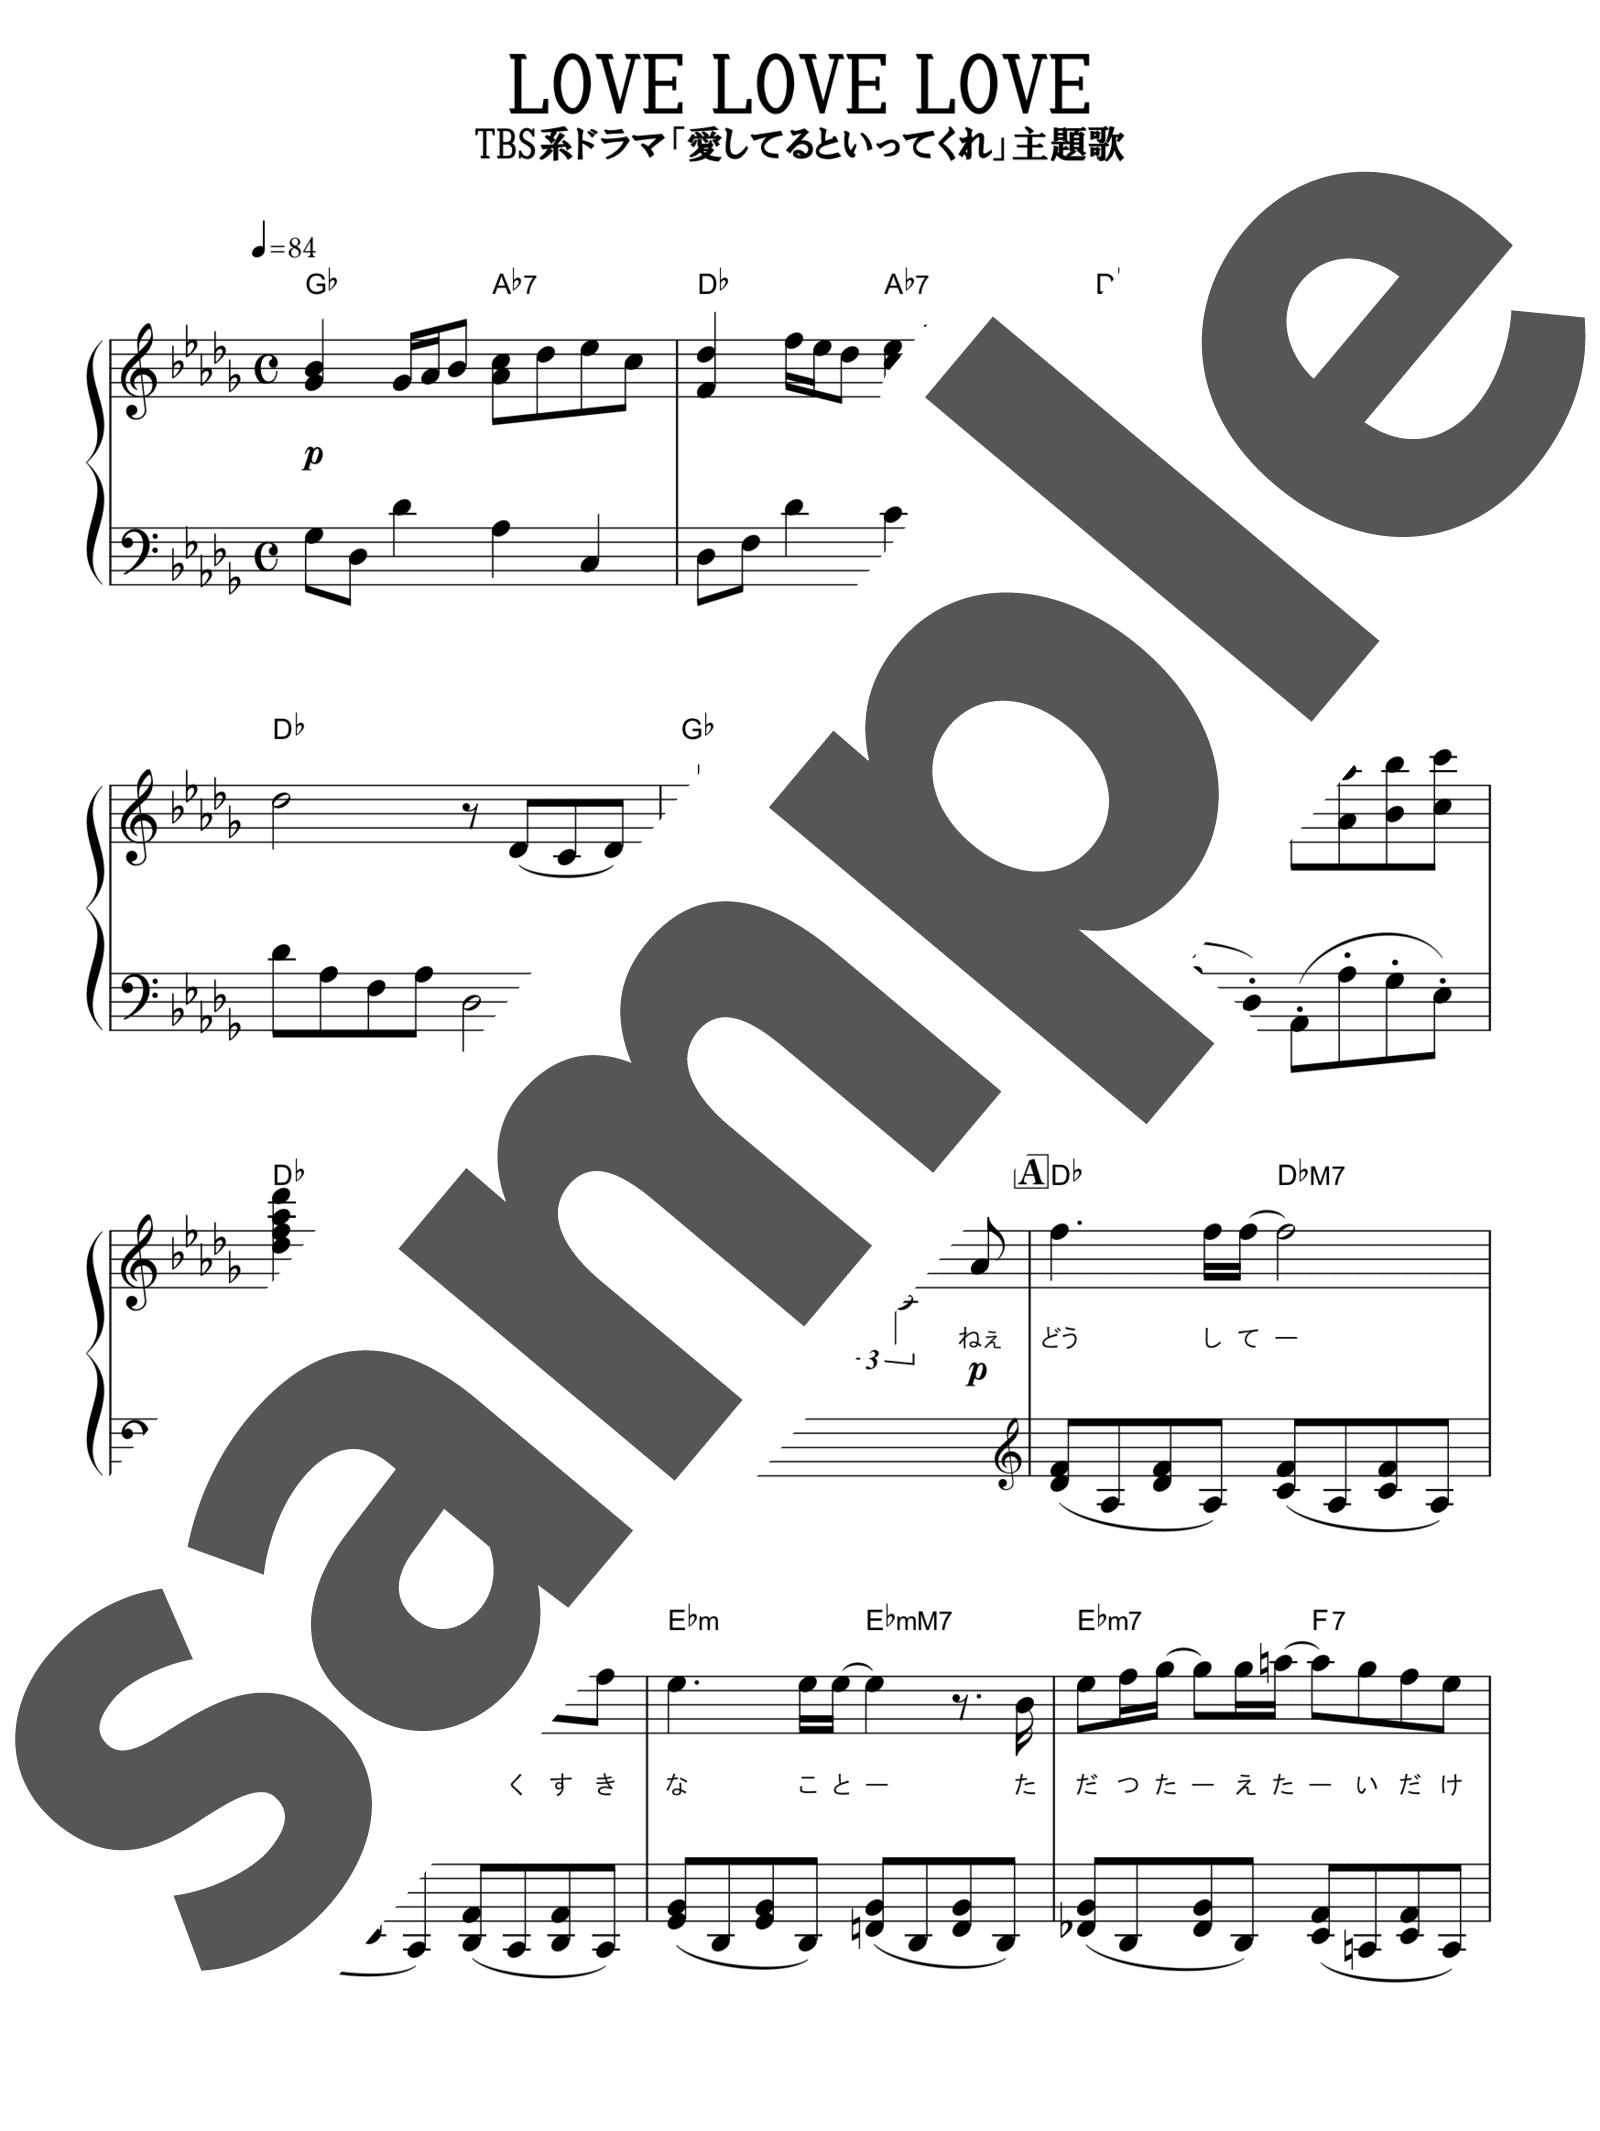 「LOVE LOVE LOVE」のサンプル楽譜